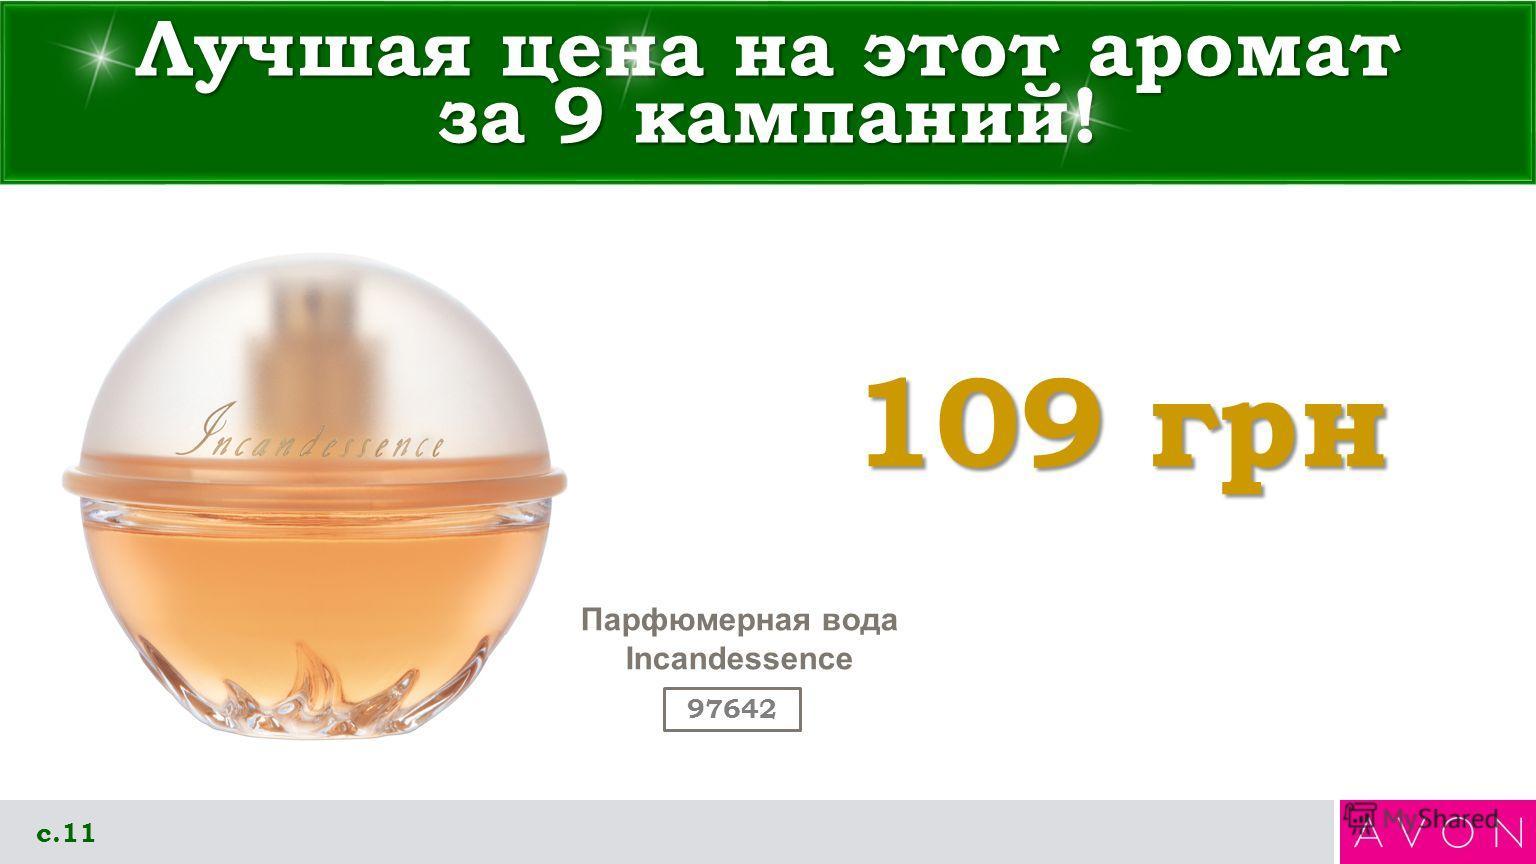 Лучшая цена на этот аромат за 9 кампаний! с.11 109 грн 97642 Парфюмерная вода Incandessence